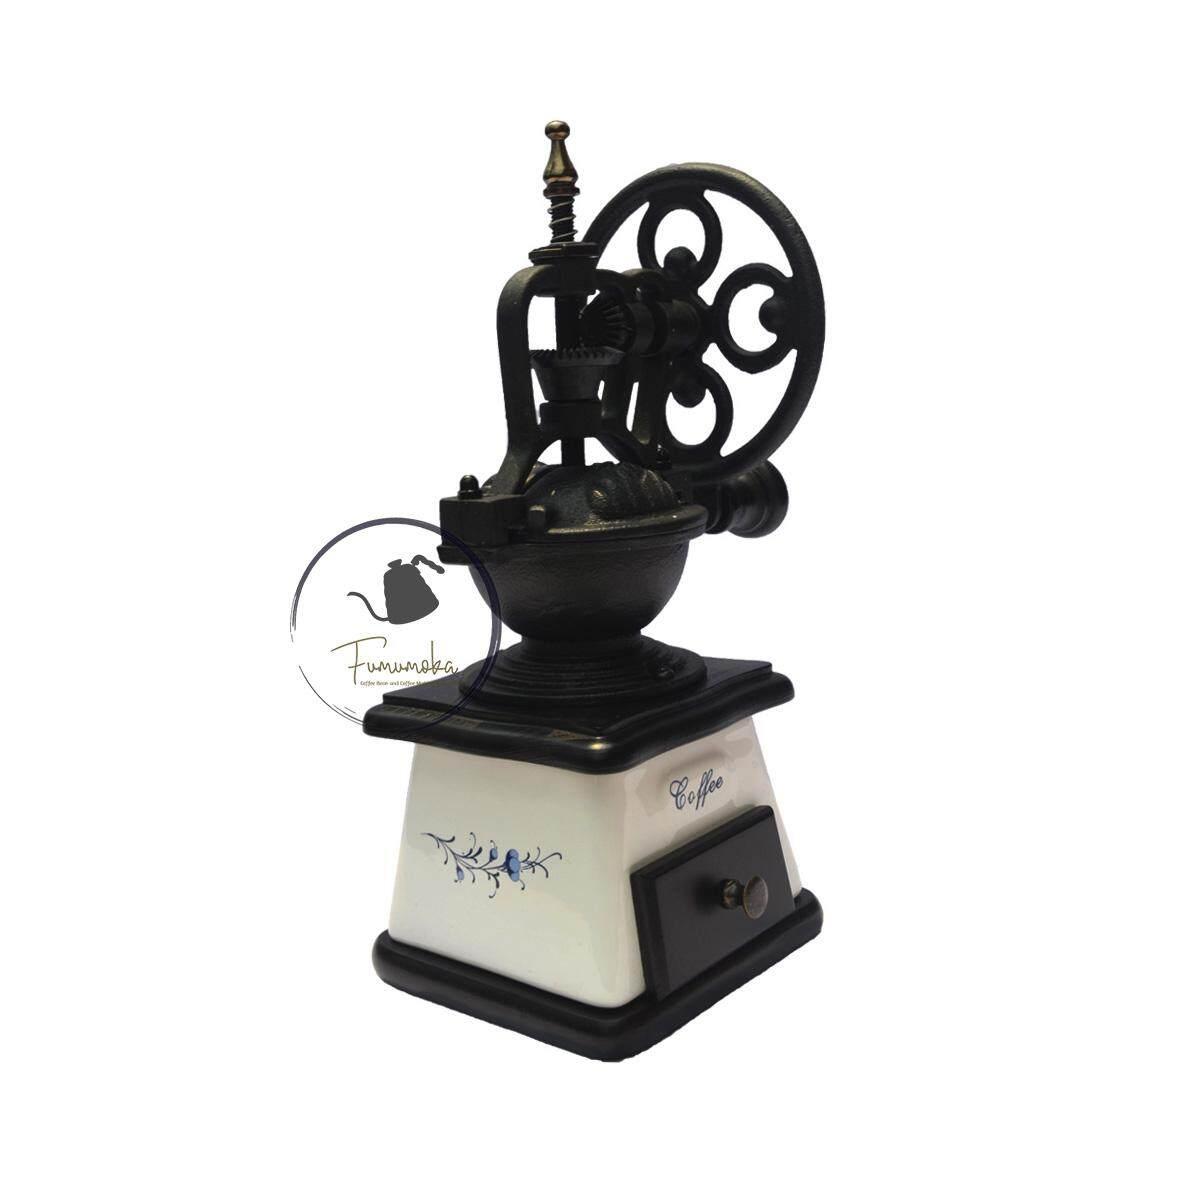 Fumumoka A18B Traditional Ceramic Handheld Coffee Bean Mill Coffee Grinder (Ceramic White)